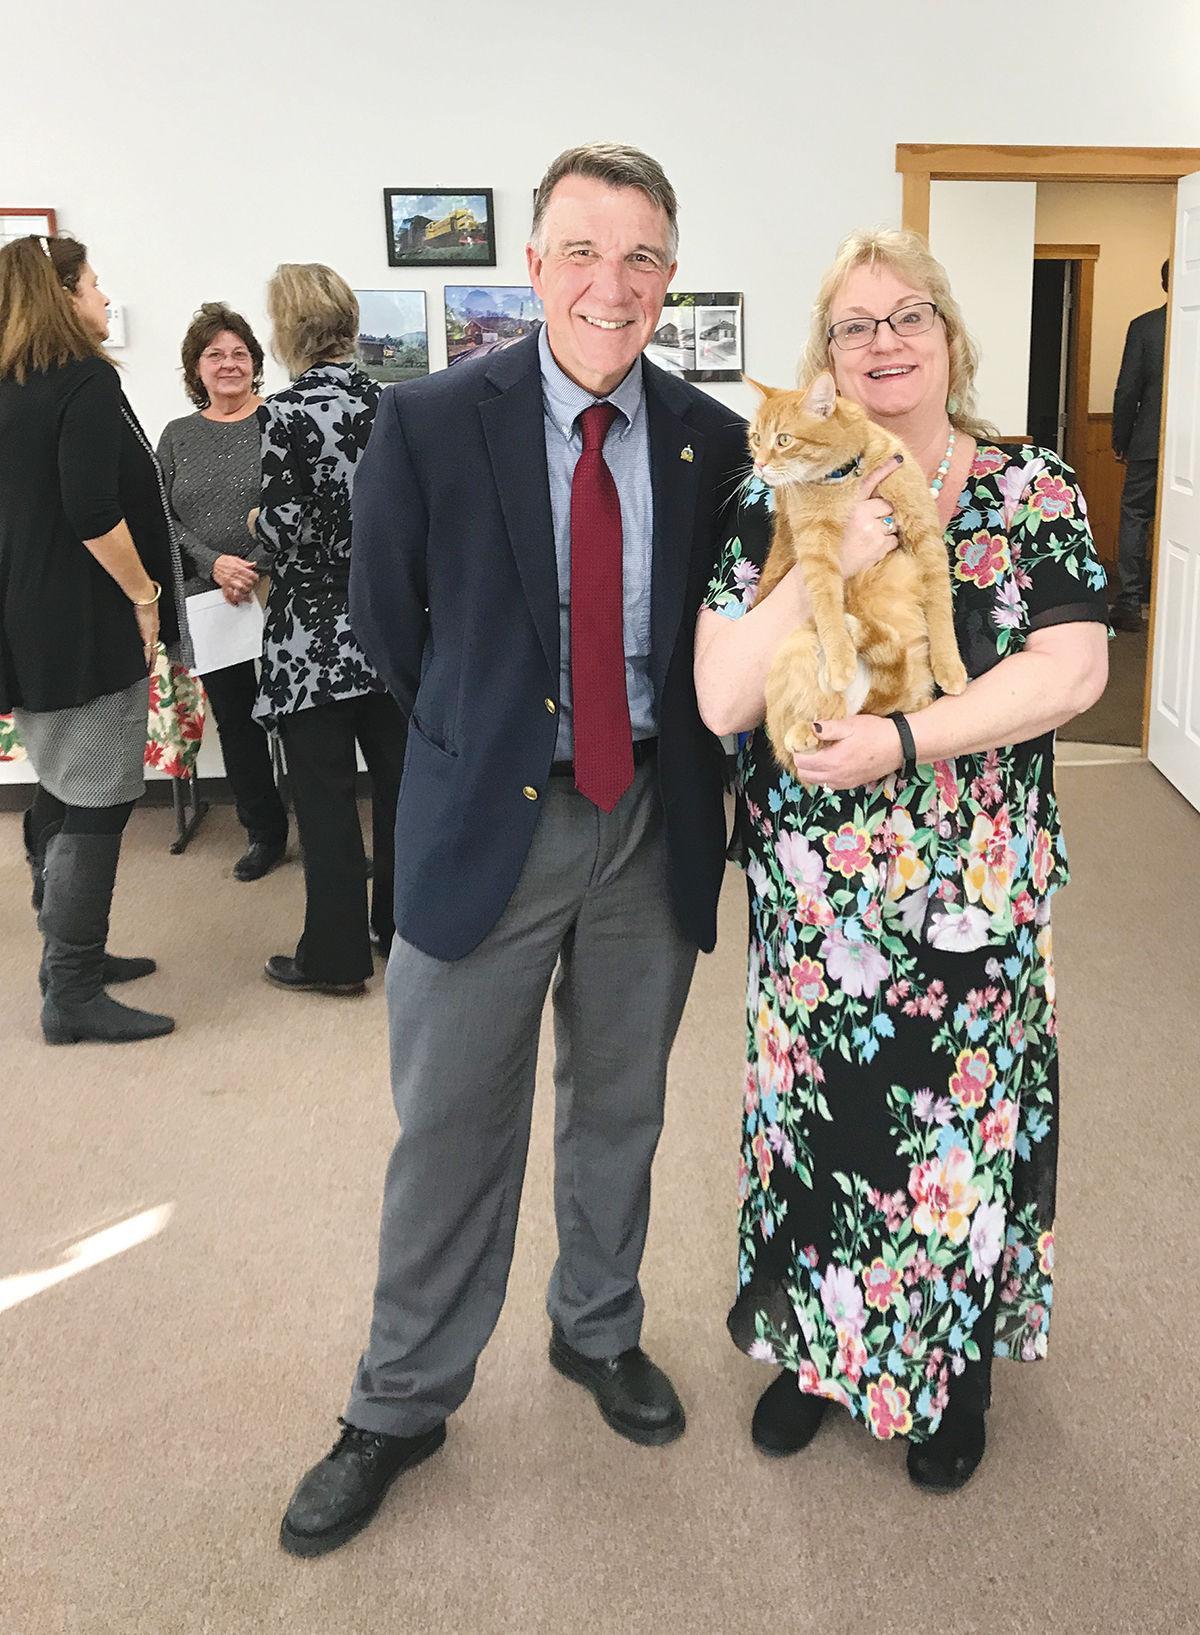 Wolcott Town Meeting 2020: Jax the Cat